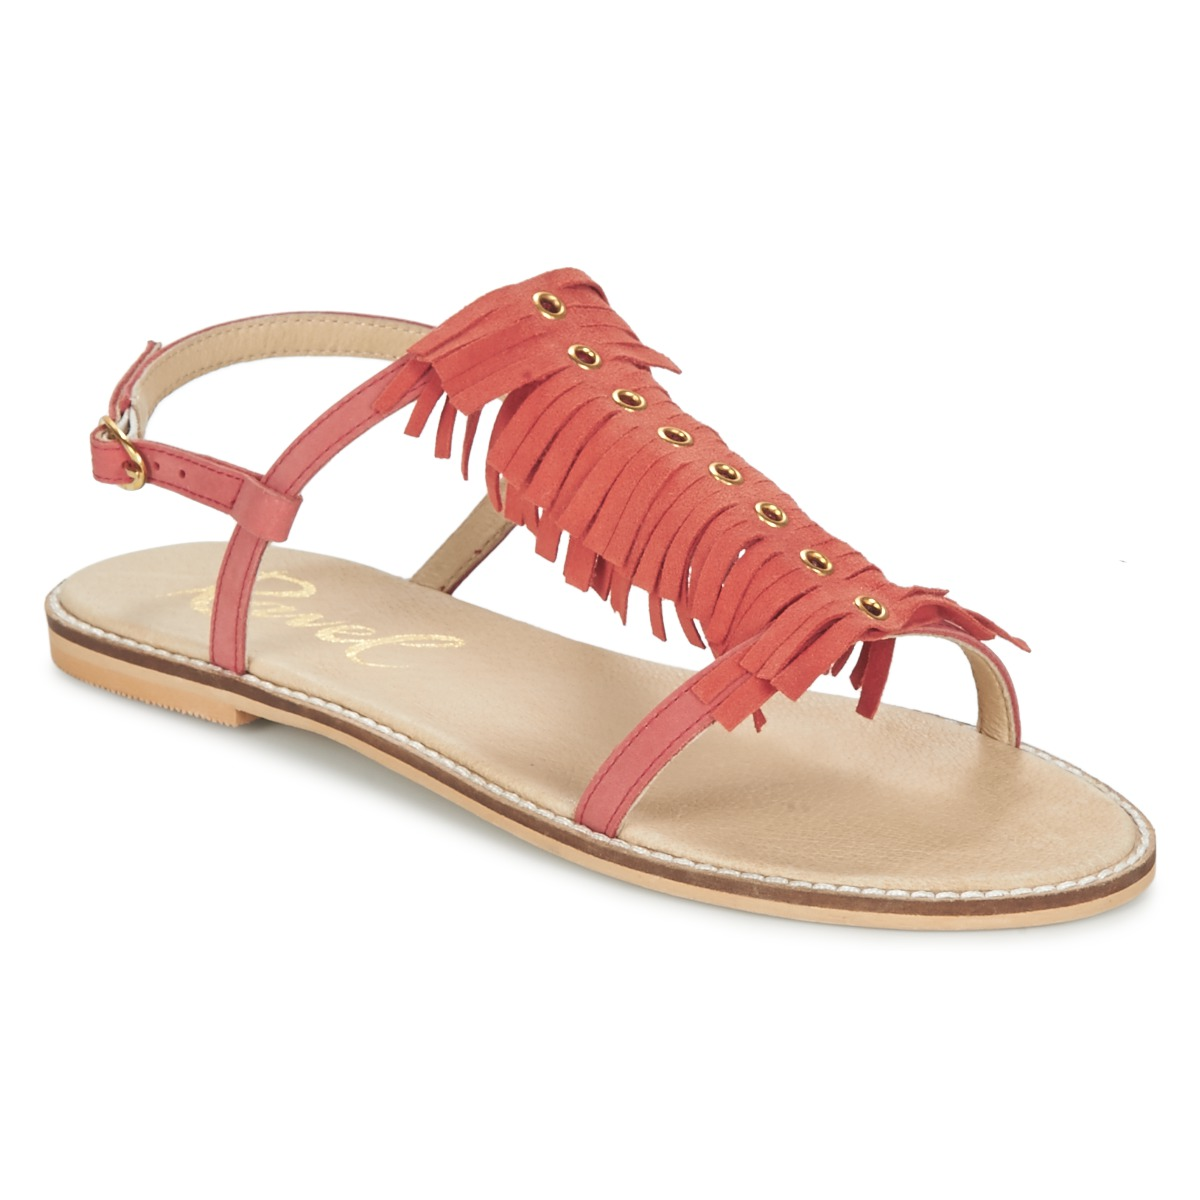 Ravel LEXINGTON Korallenrot - Kostenloser Versand bei Spartoode ! - Schuhe Sandalen / Sandaletten Damen 39,19 €